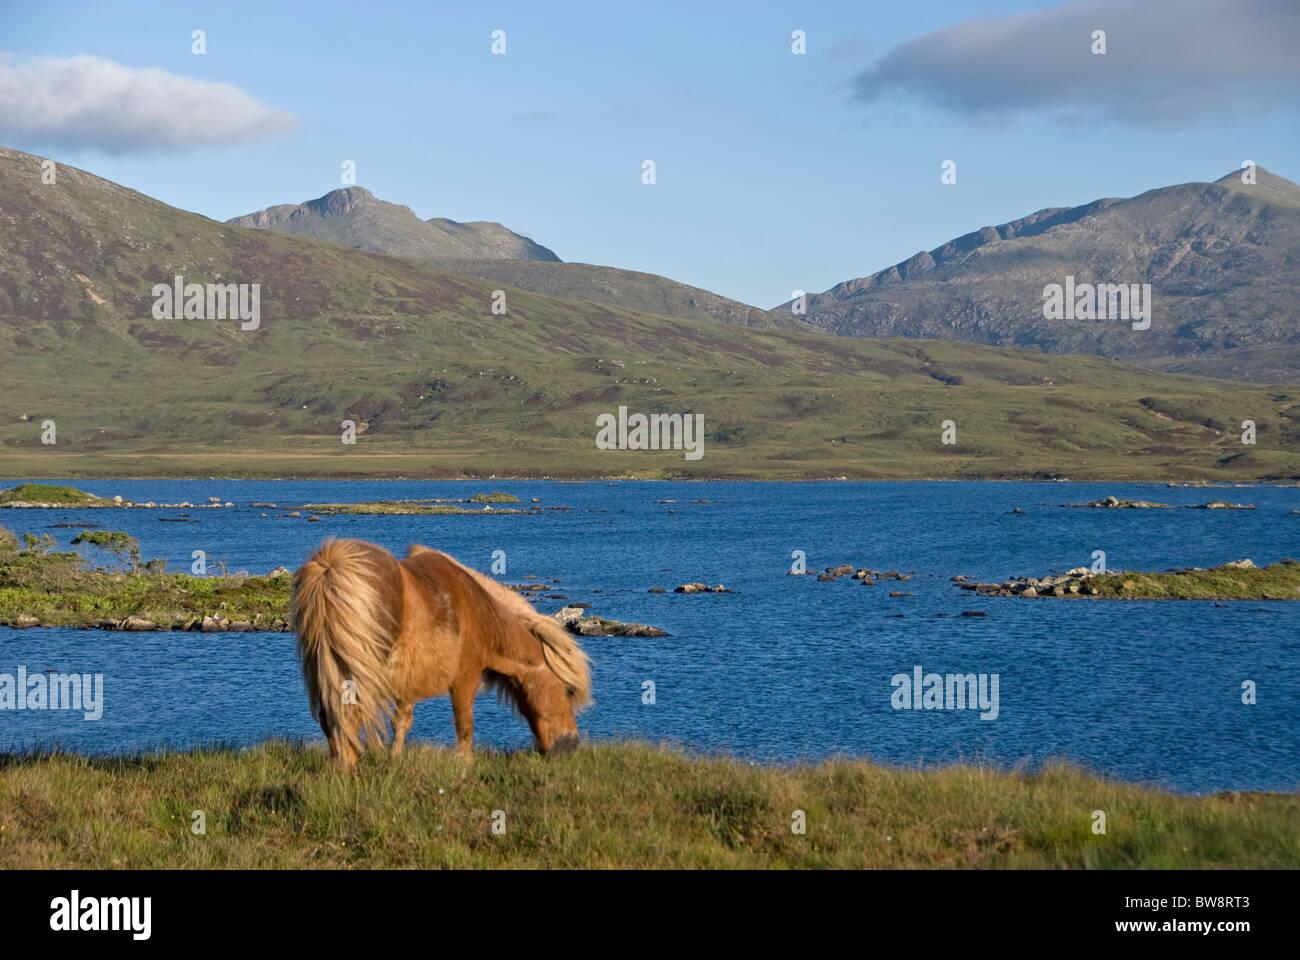 Loch Druidibeg South Uist, Outer Hebrides, Western Isles, Scotland.  SCO 6488 - Stock Image